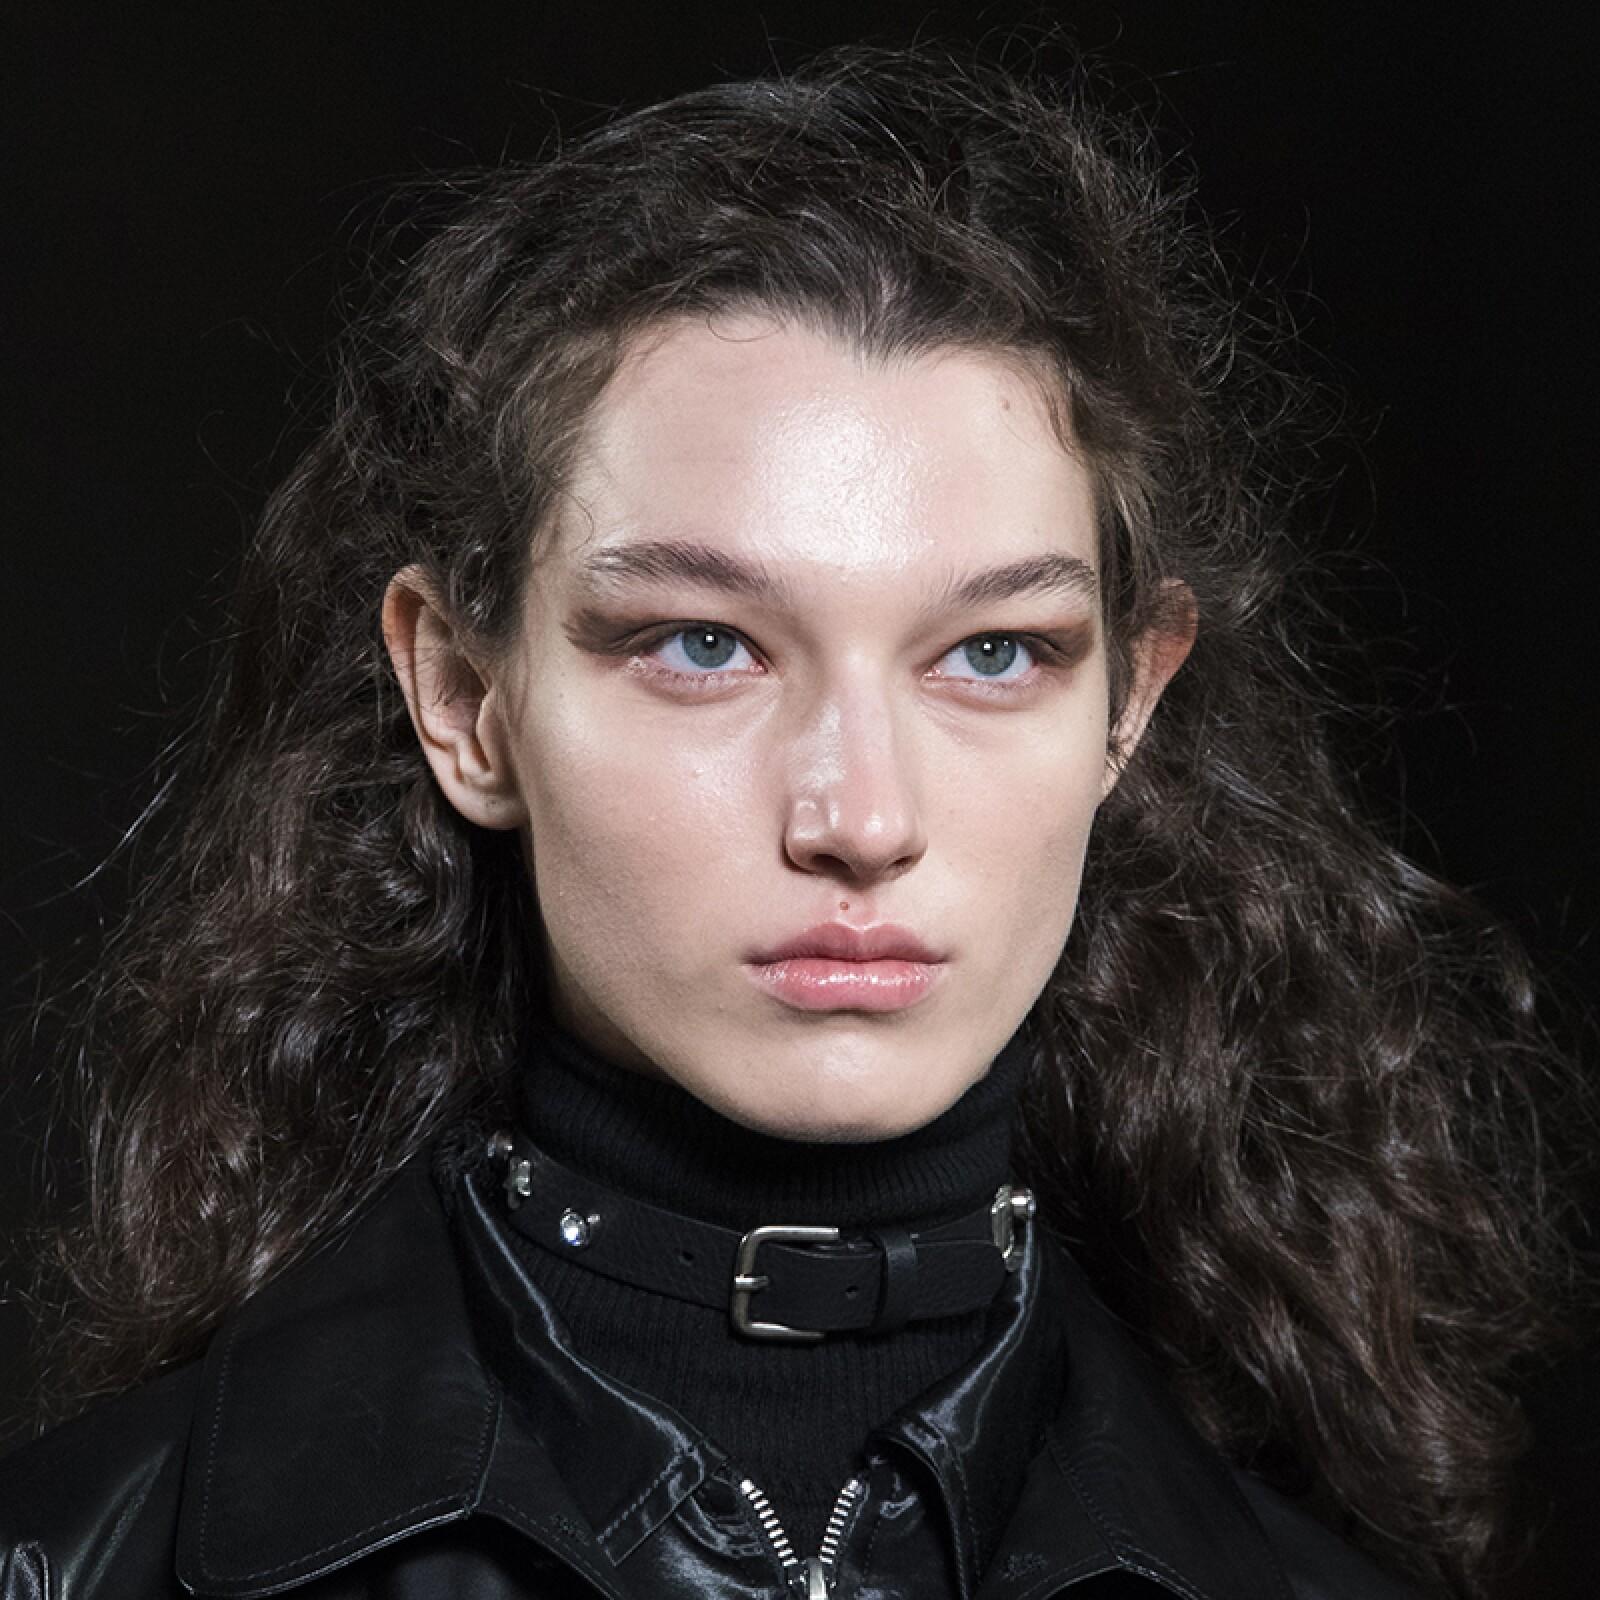 lfw-fashion-week-runway-beauty-looks-maquillaje-alexachung